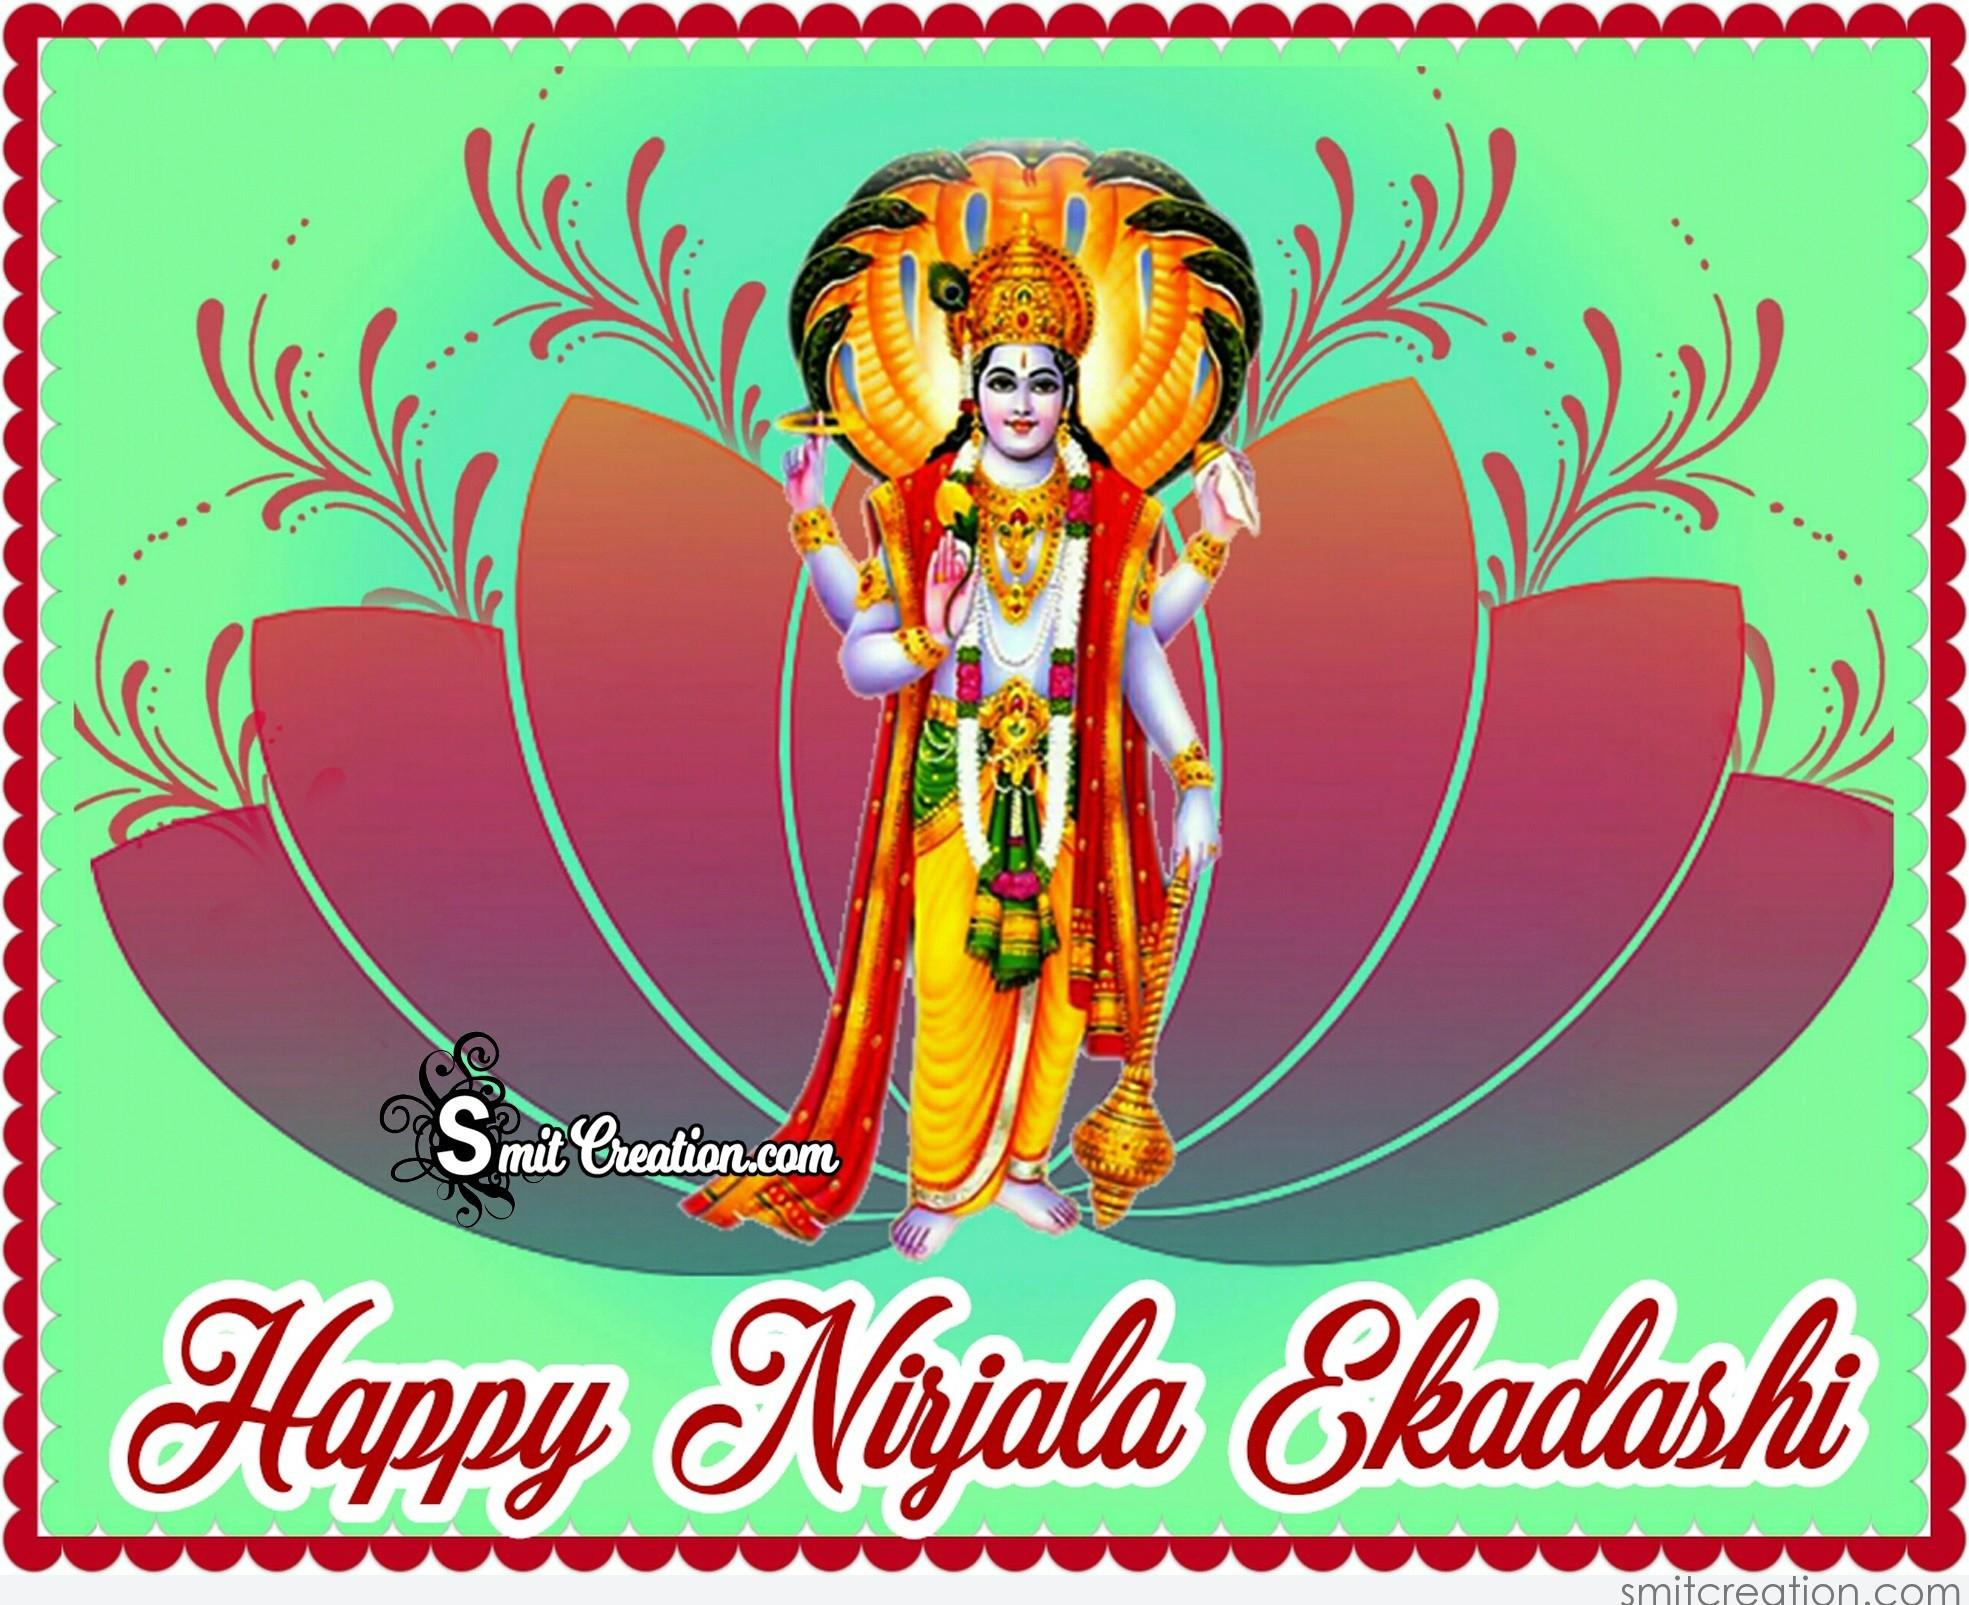 happy nirjala ekadashi smitcreation